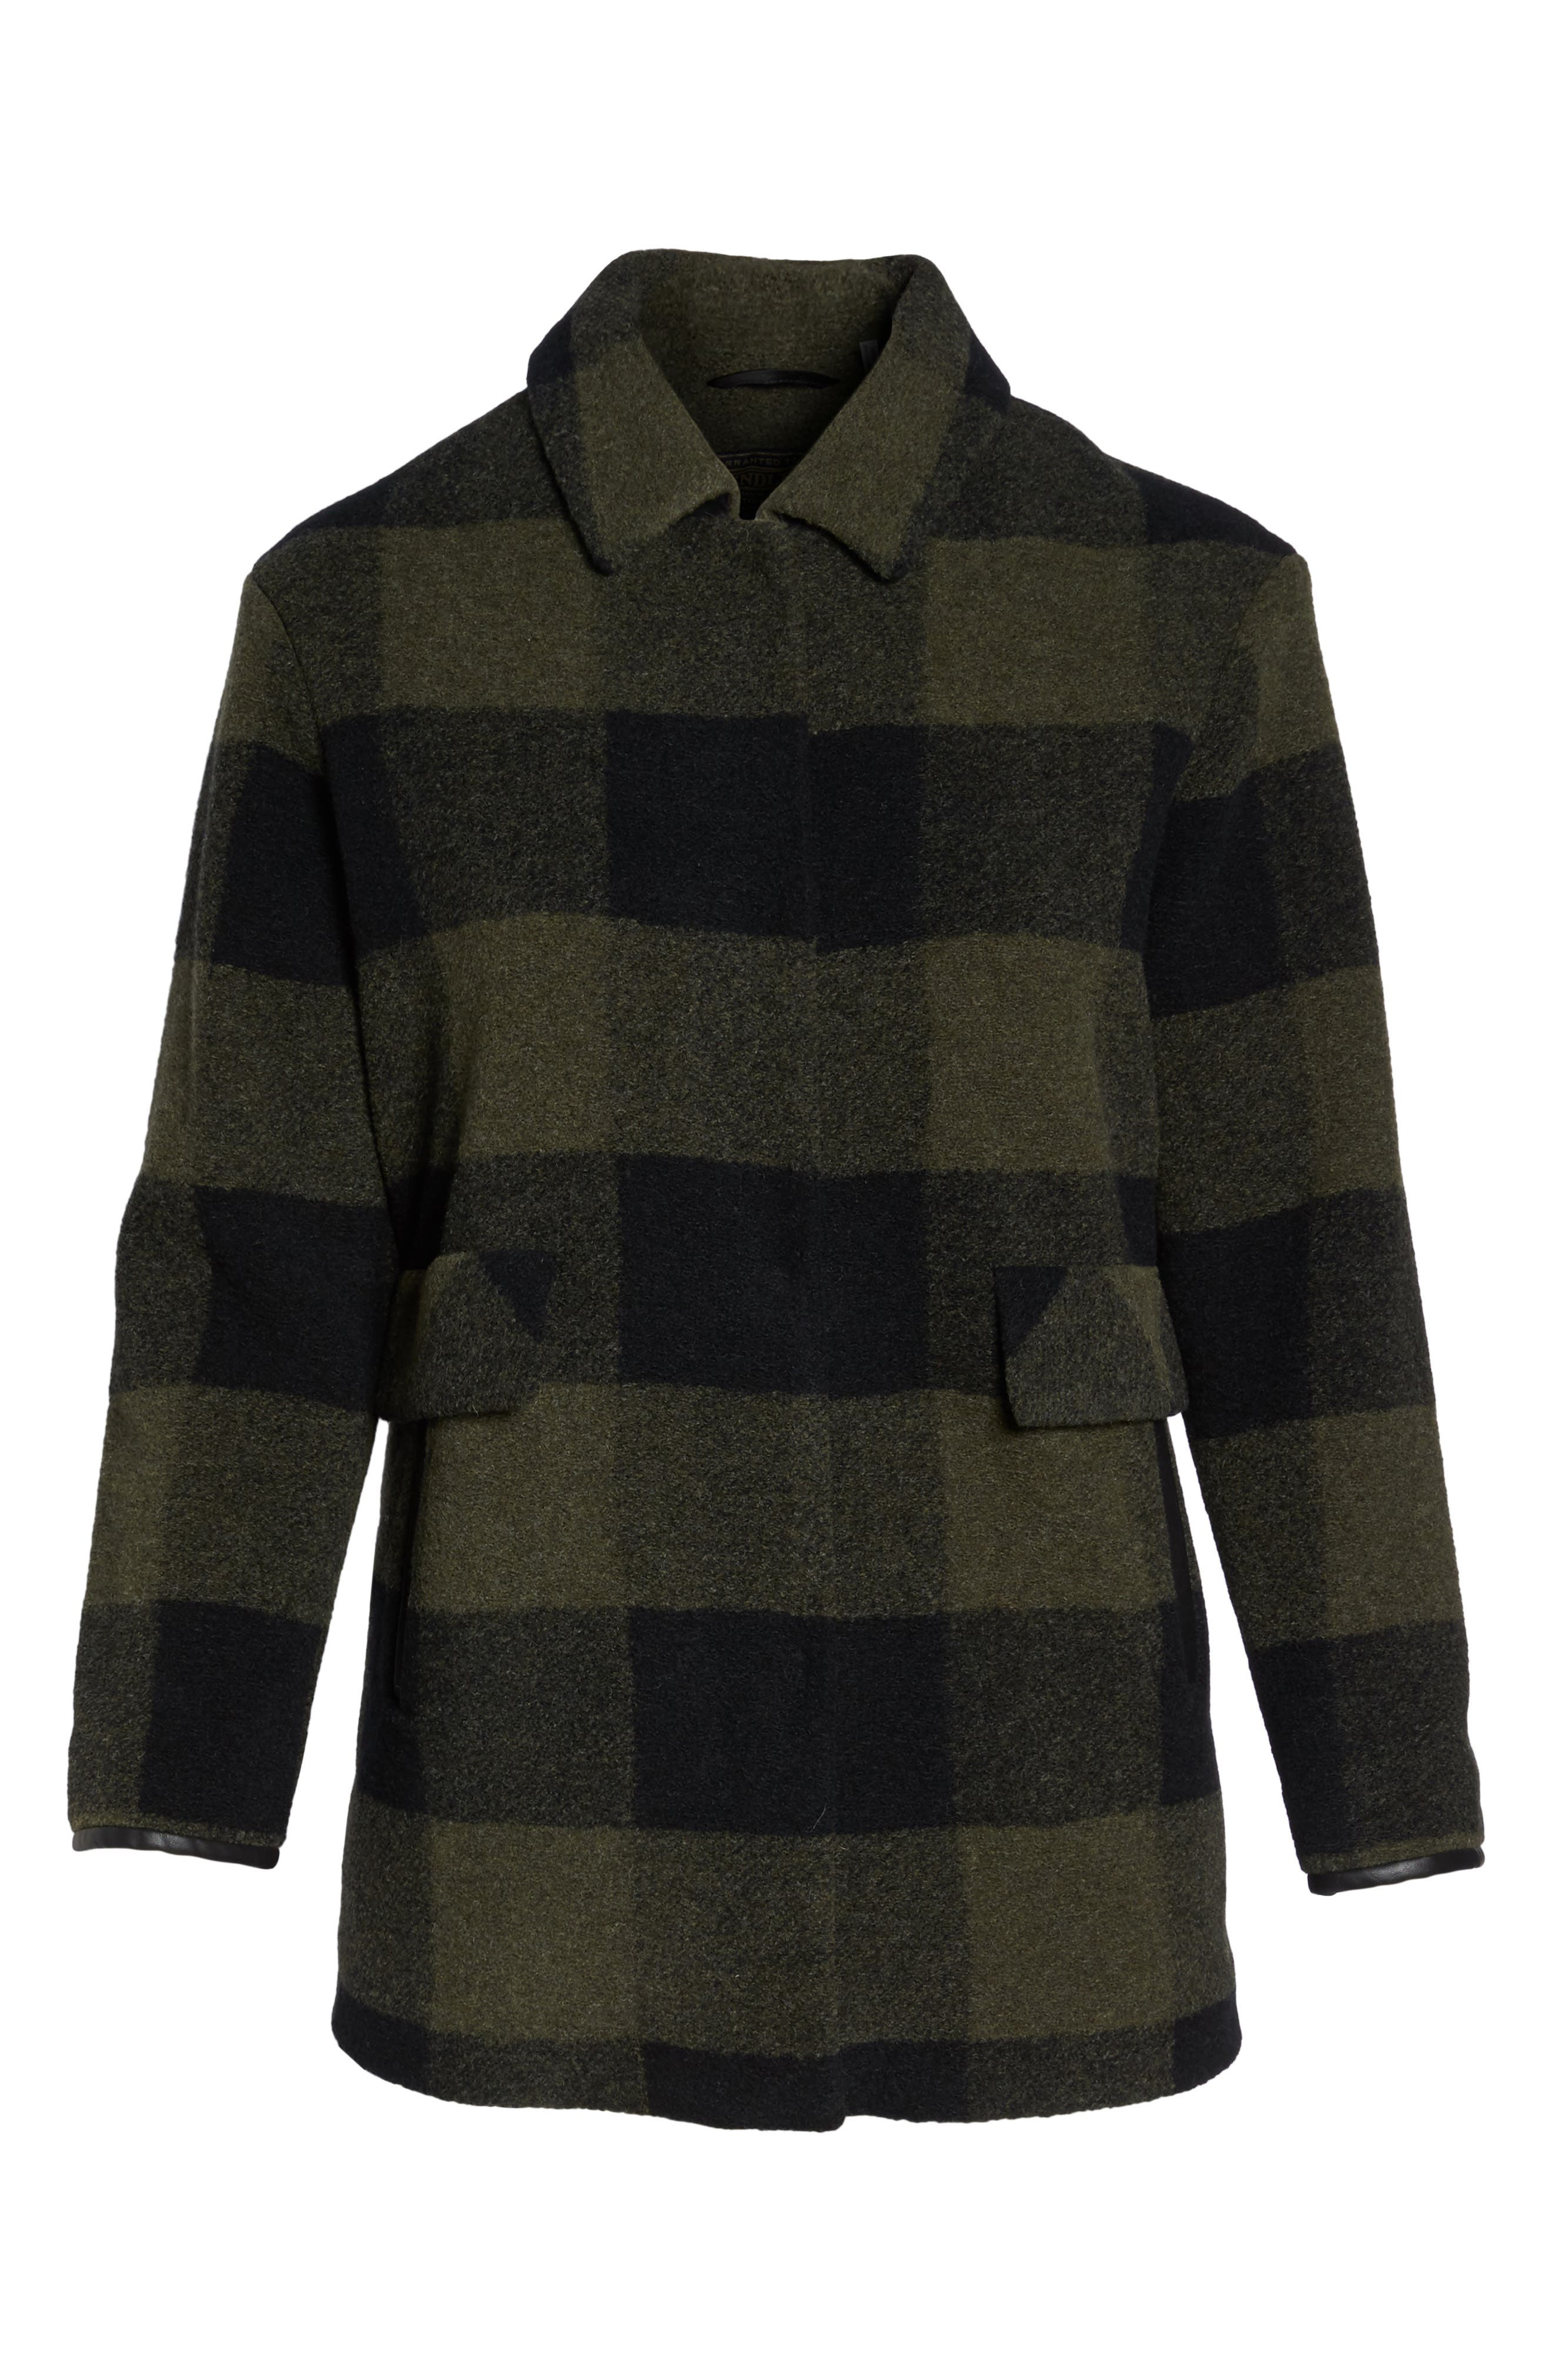 Paul Bunyan Plaid Wool Blend Barn Coat,                             Alternate thumbnail 6, color,                             Olive/ Buff